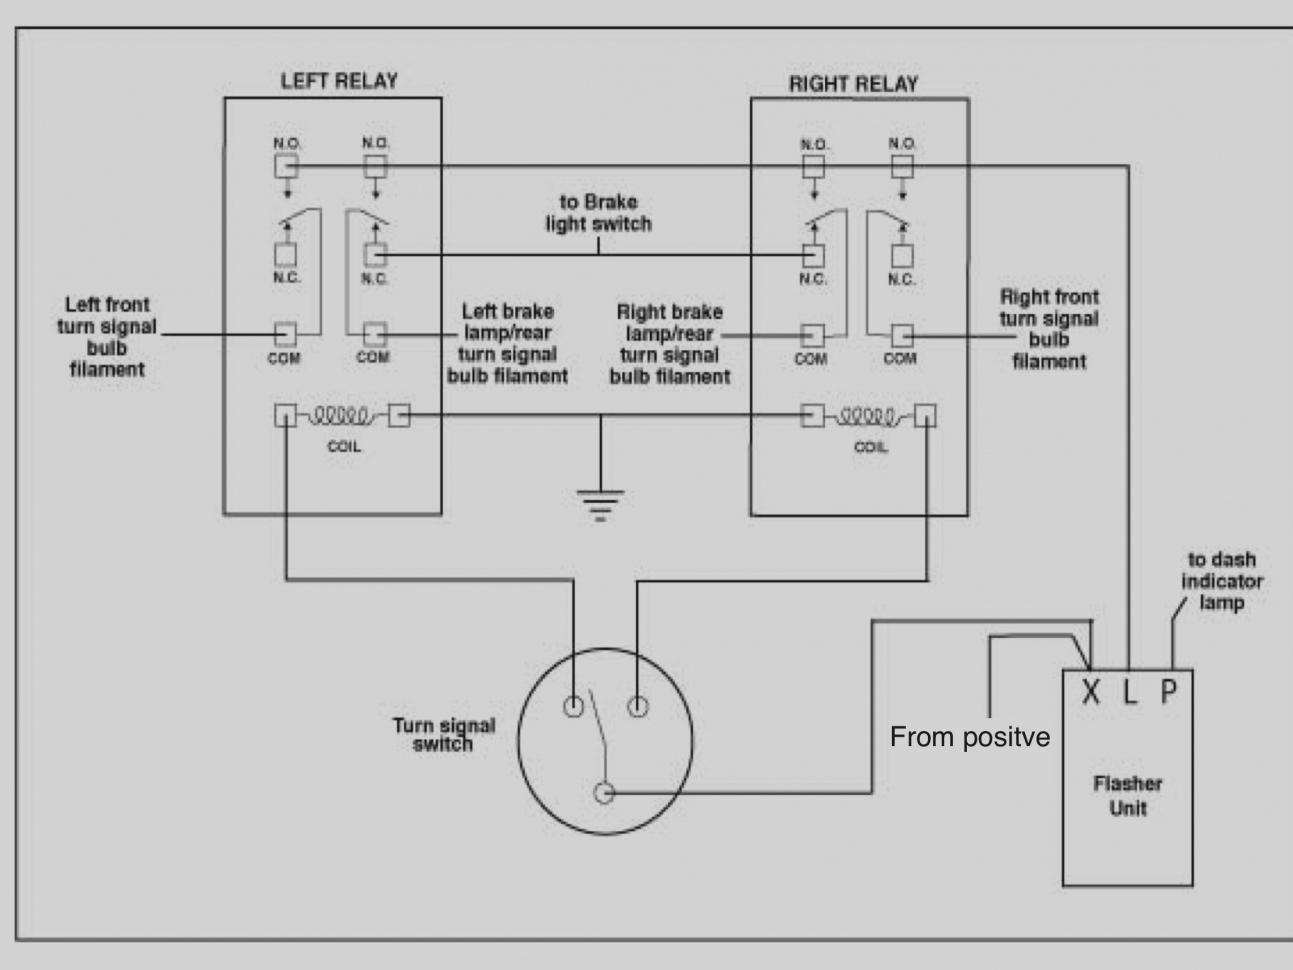 rzr blinker wiring diagram diagram data schemapolaris rzr turn signal wiring diagram data wiring diagram rzr blinker wiring diagram polaris rzr wiring